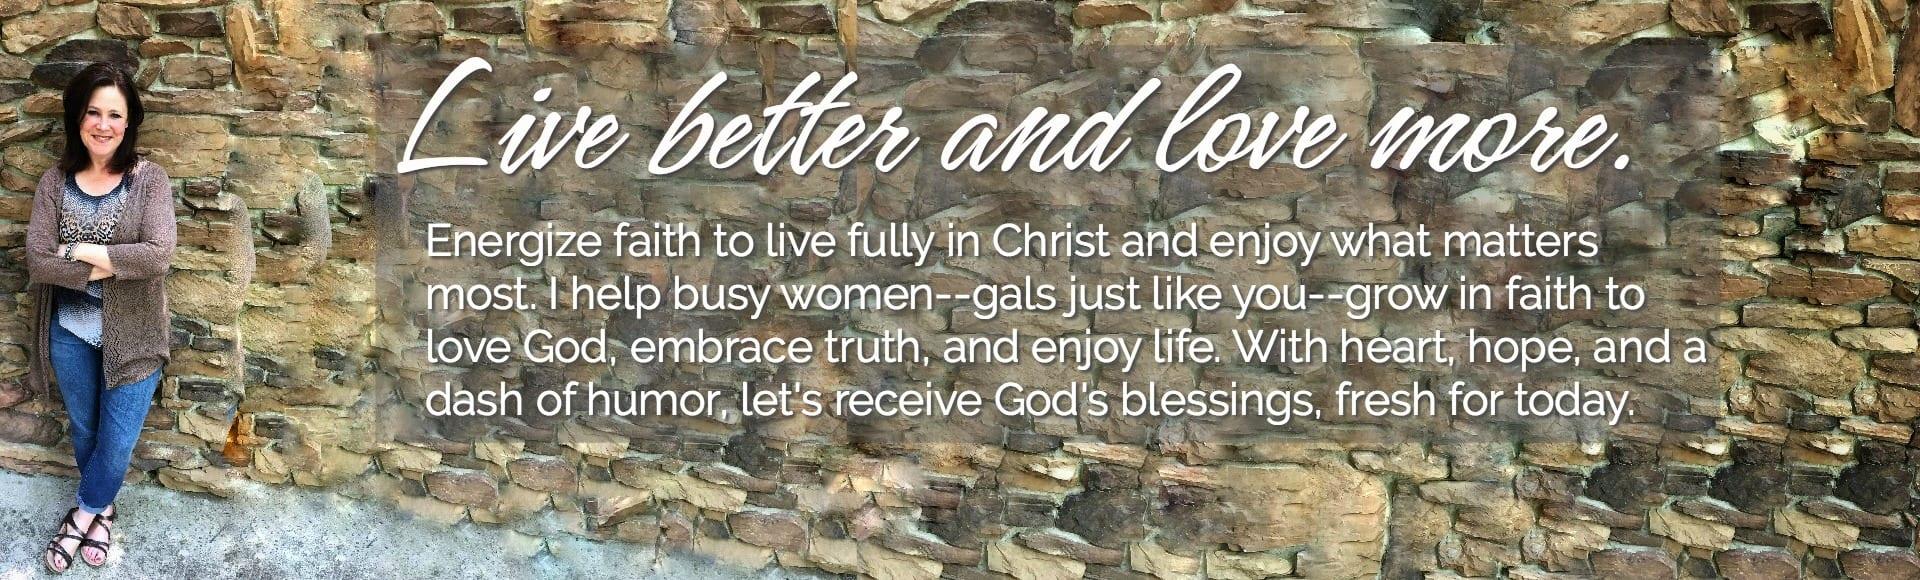 Ginger Harrington encourages women to love God, embrace truth, and enjoy life with fresh faith.